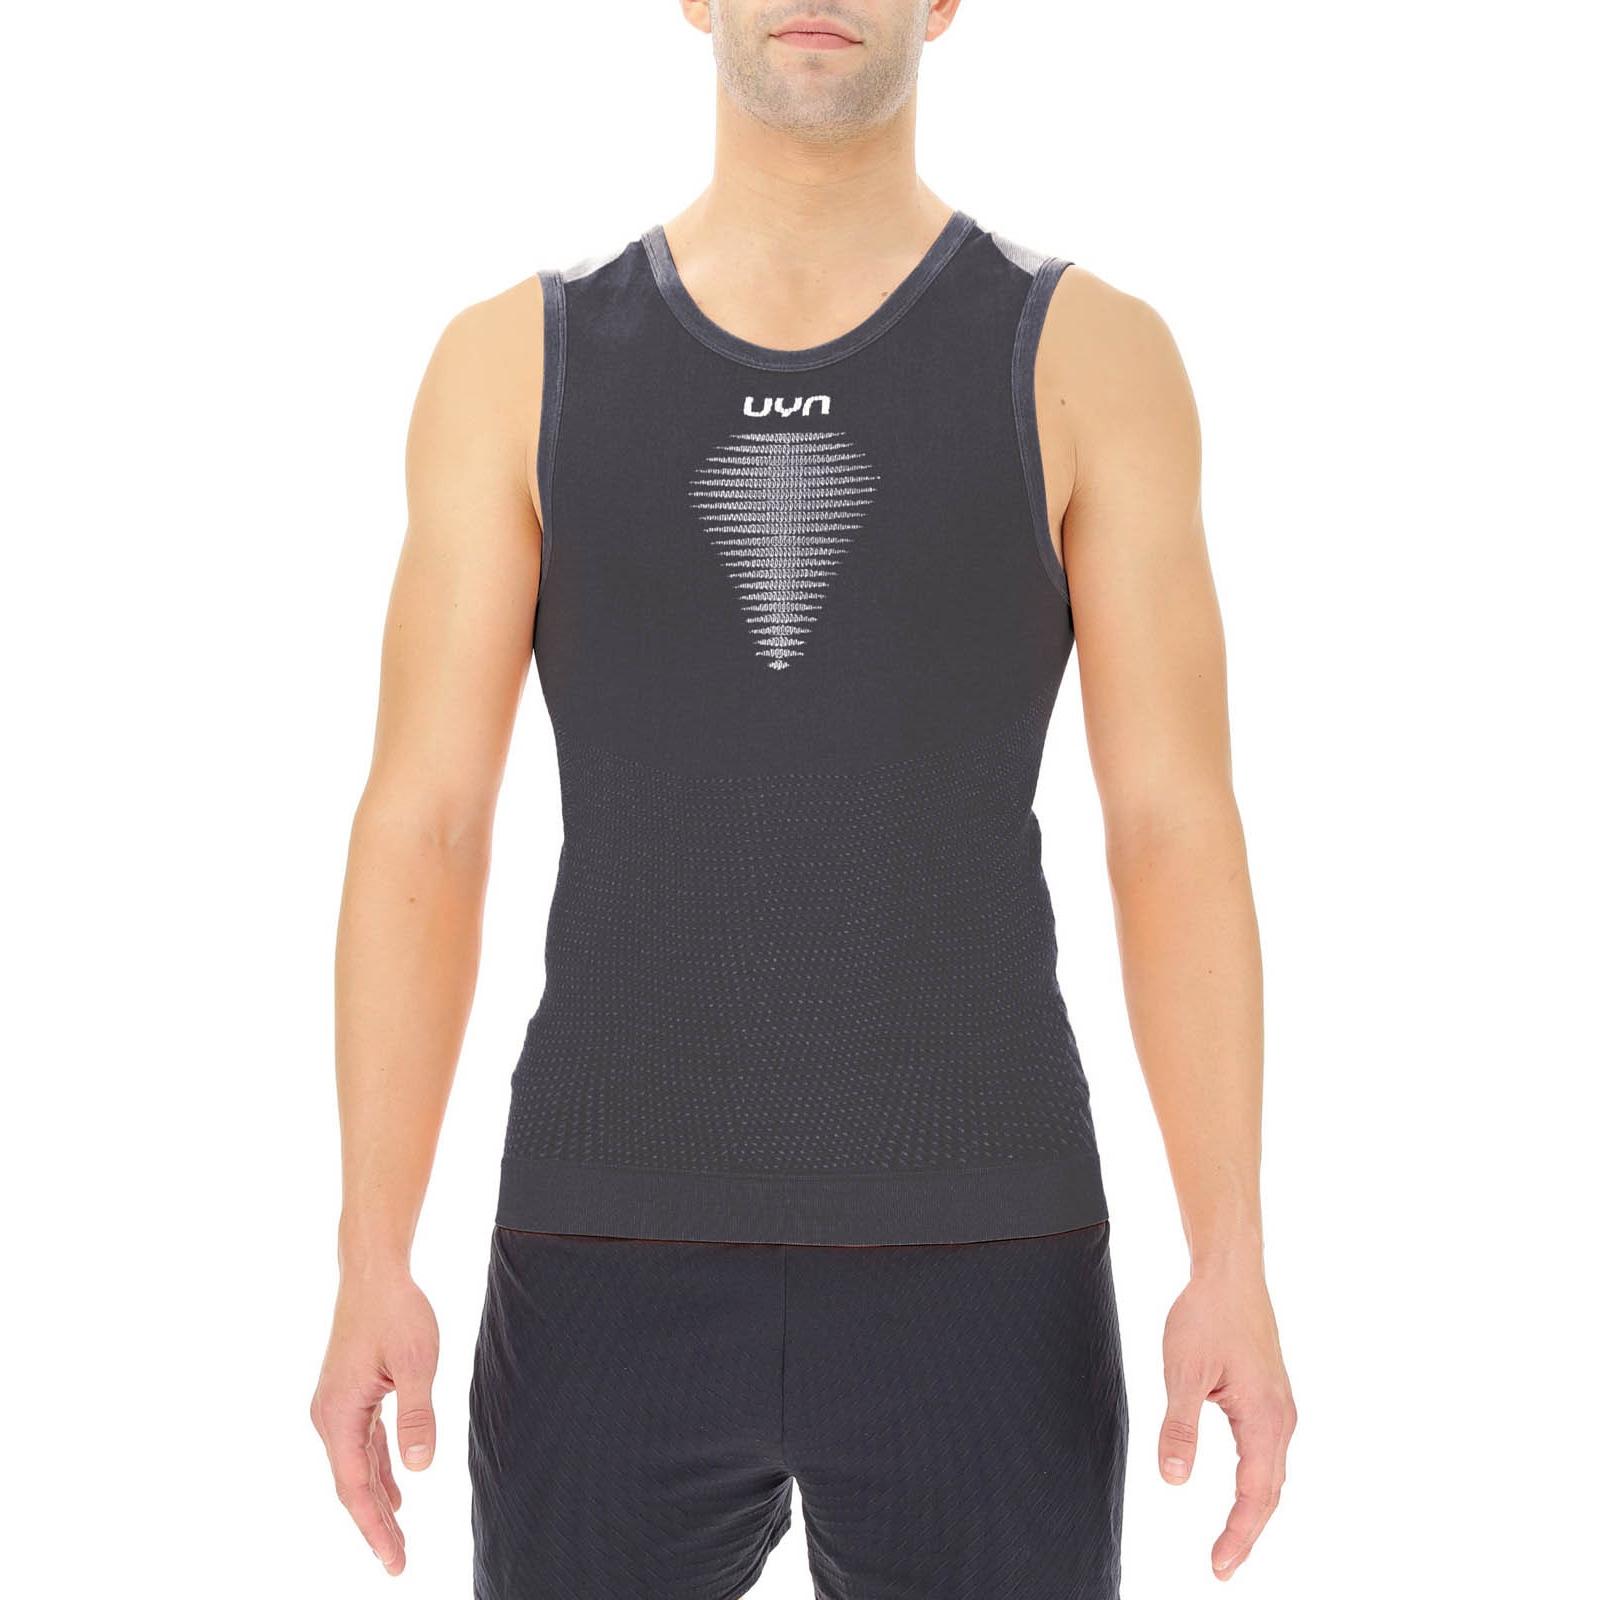 UYN Marathon Running Man Sleeveless - Blackboard/White